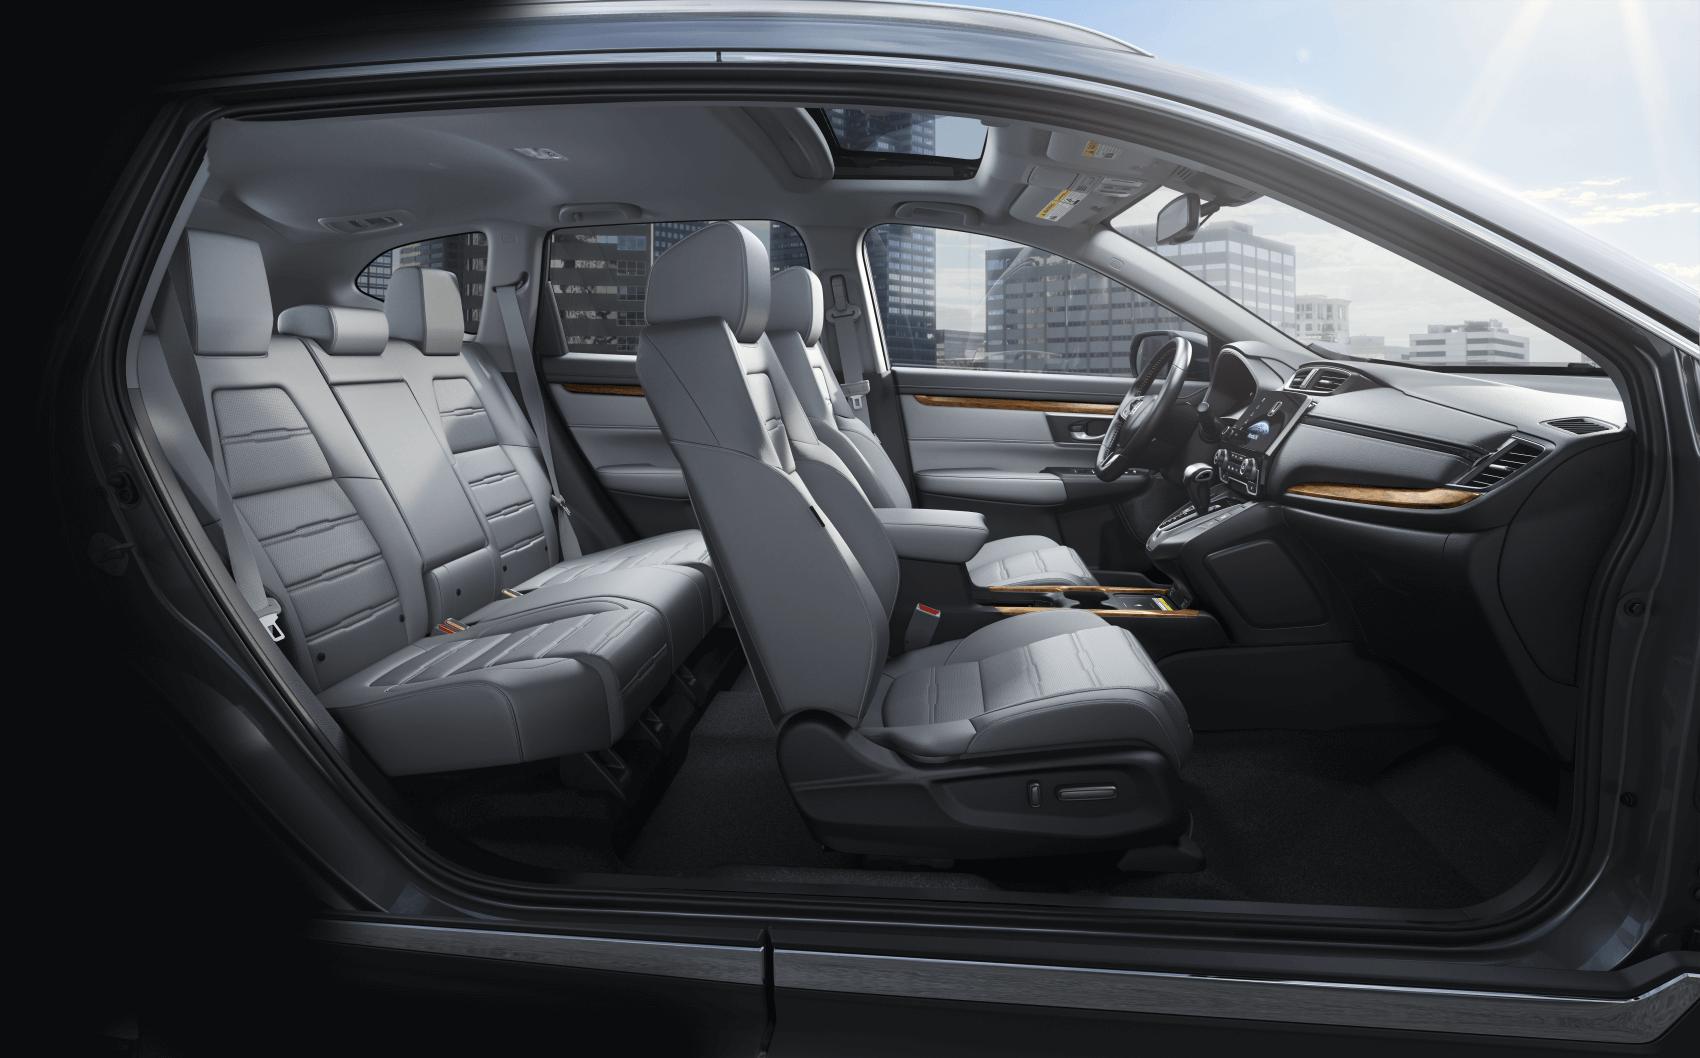 Honda CR-V Interior Cabin Space